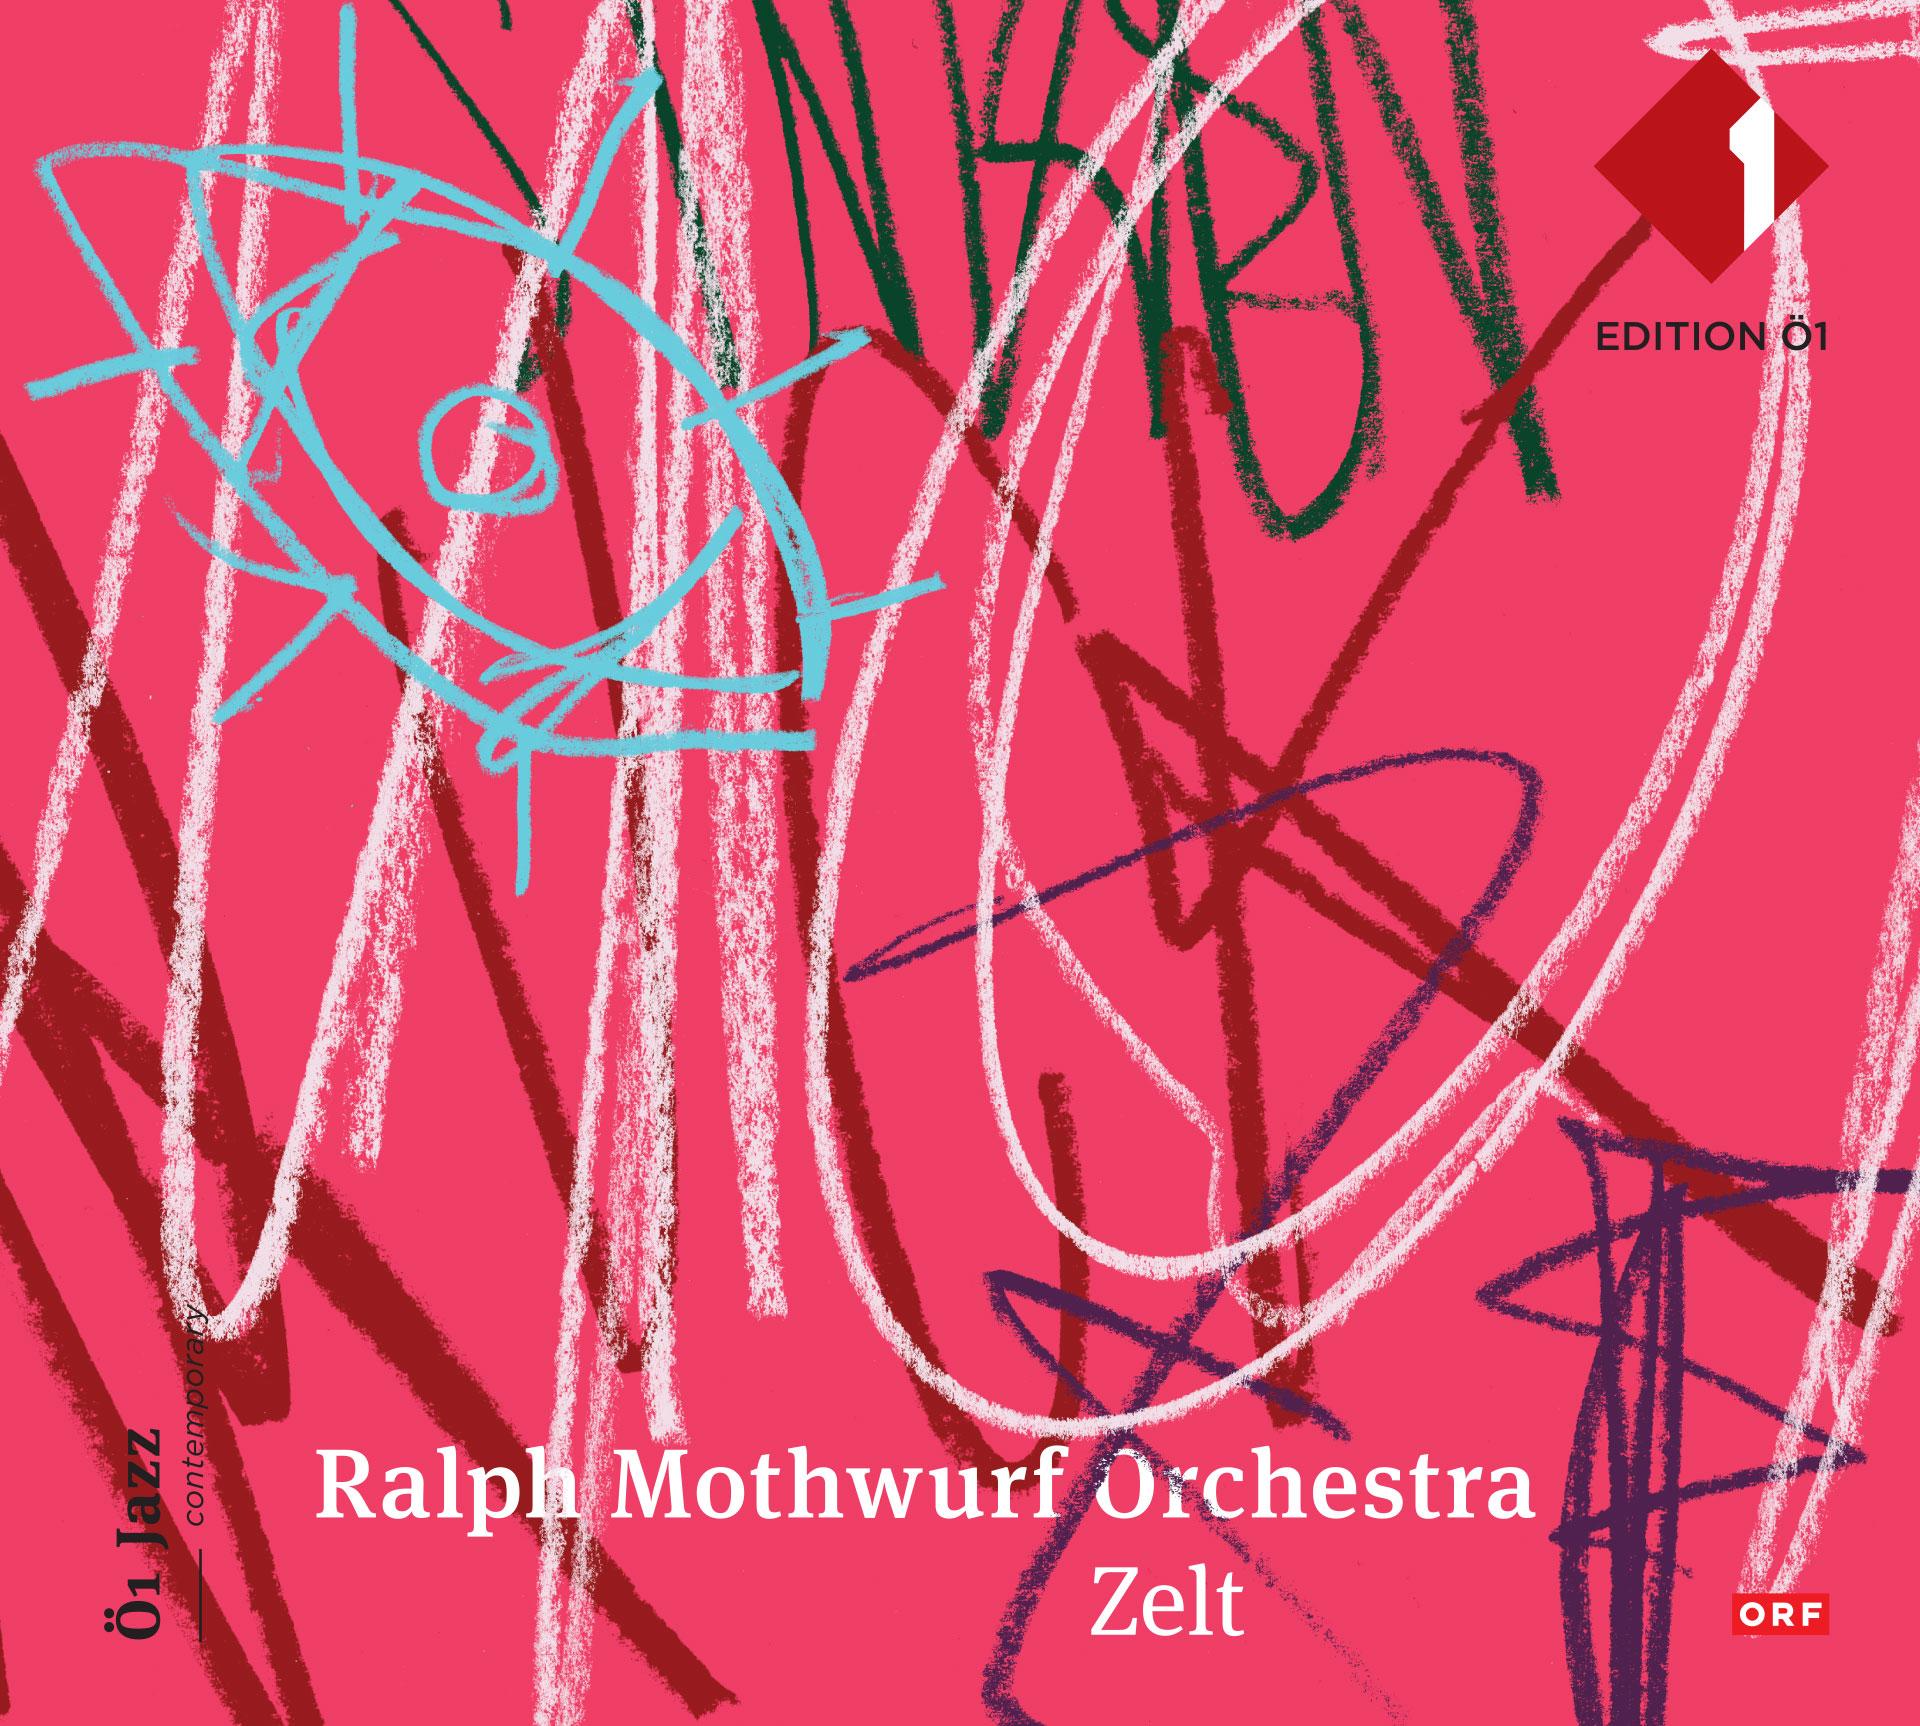 RMO_ZELT_Cover_OE1-Jazz-Contemporary_1920x1726px_72dpi